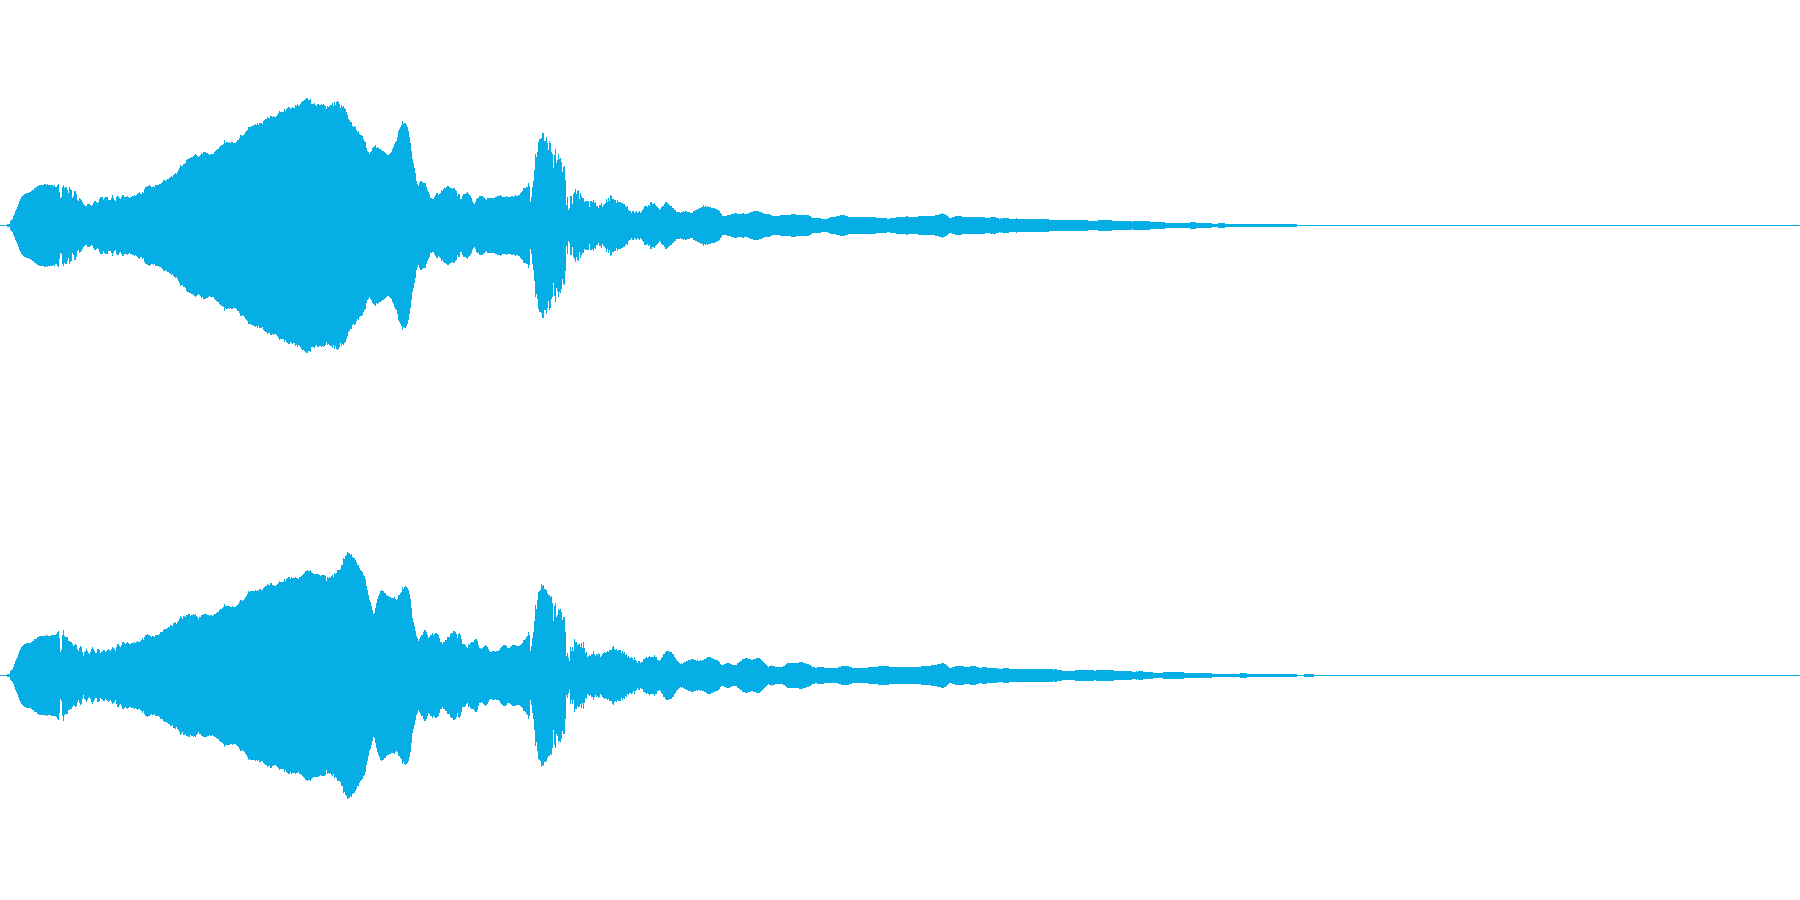 尺八 生演奏 古典風 残響音有 #4の再生済みの波形